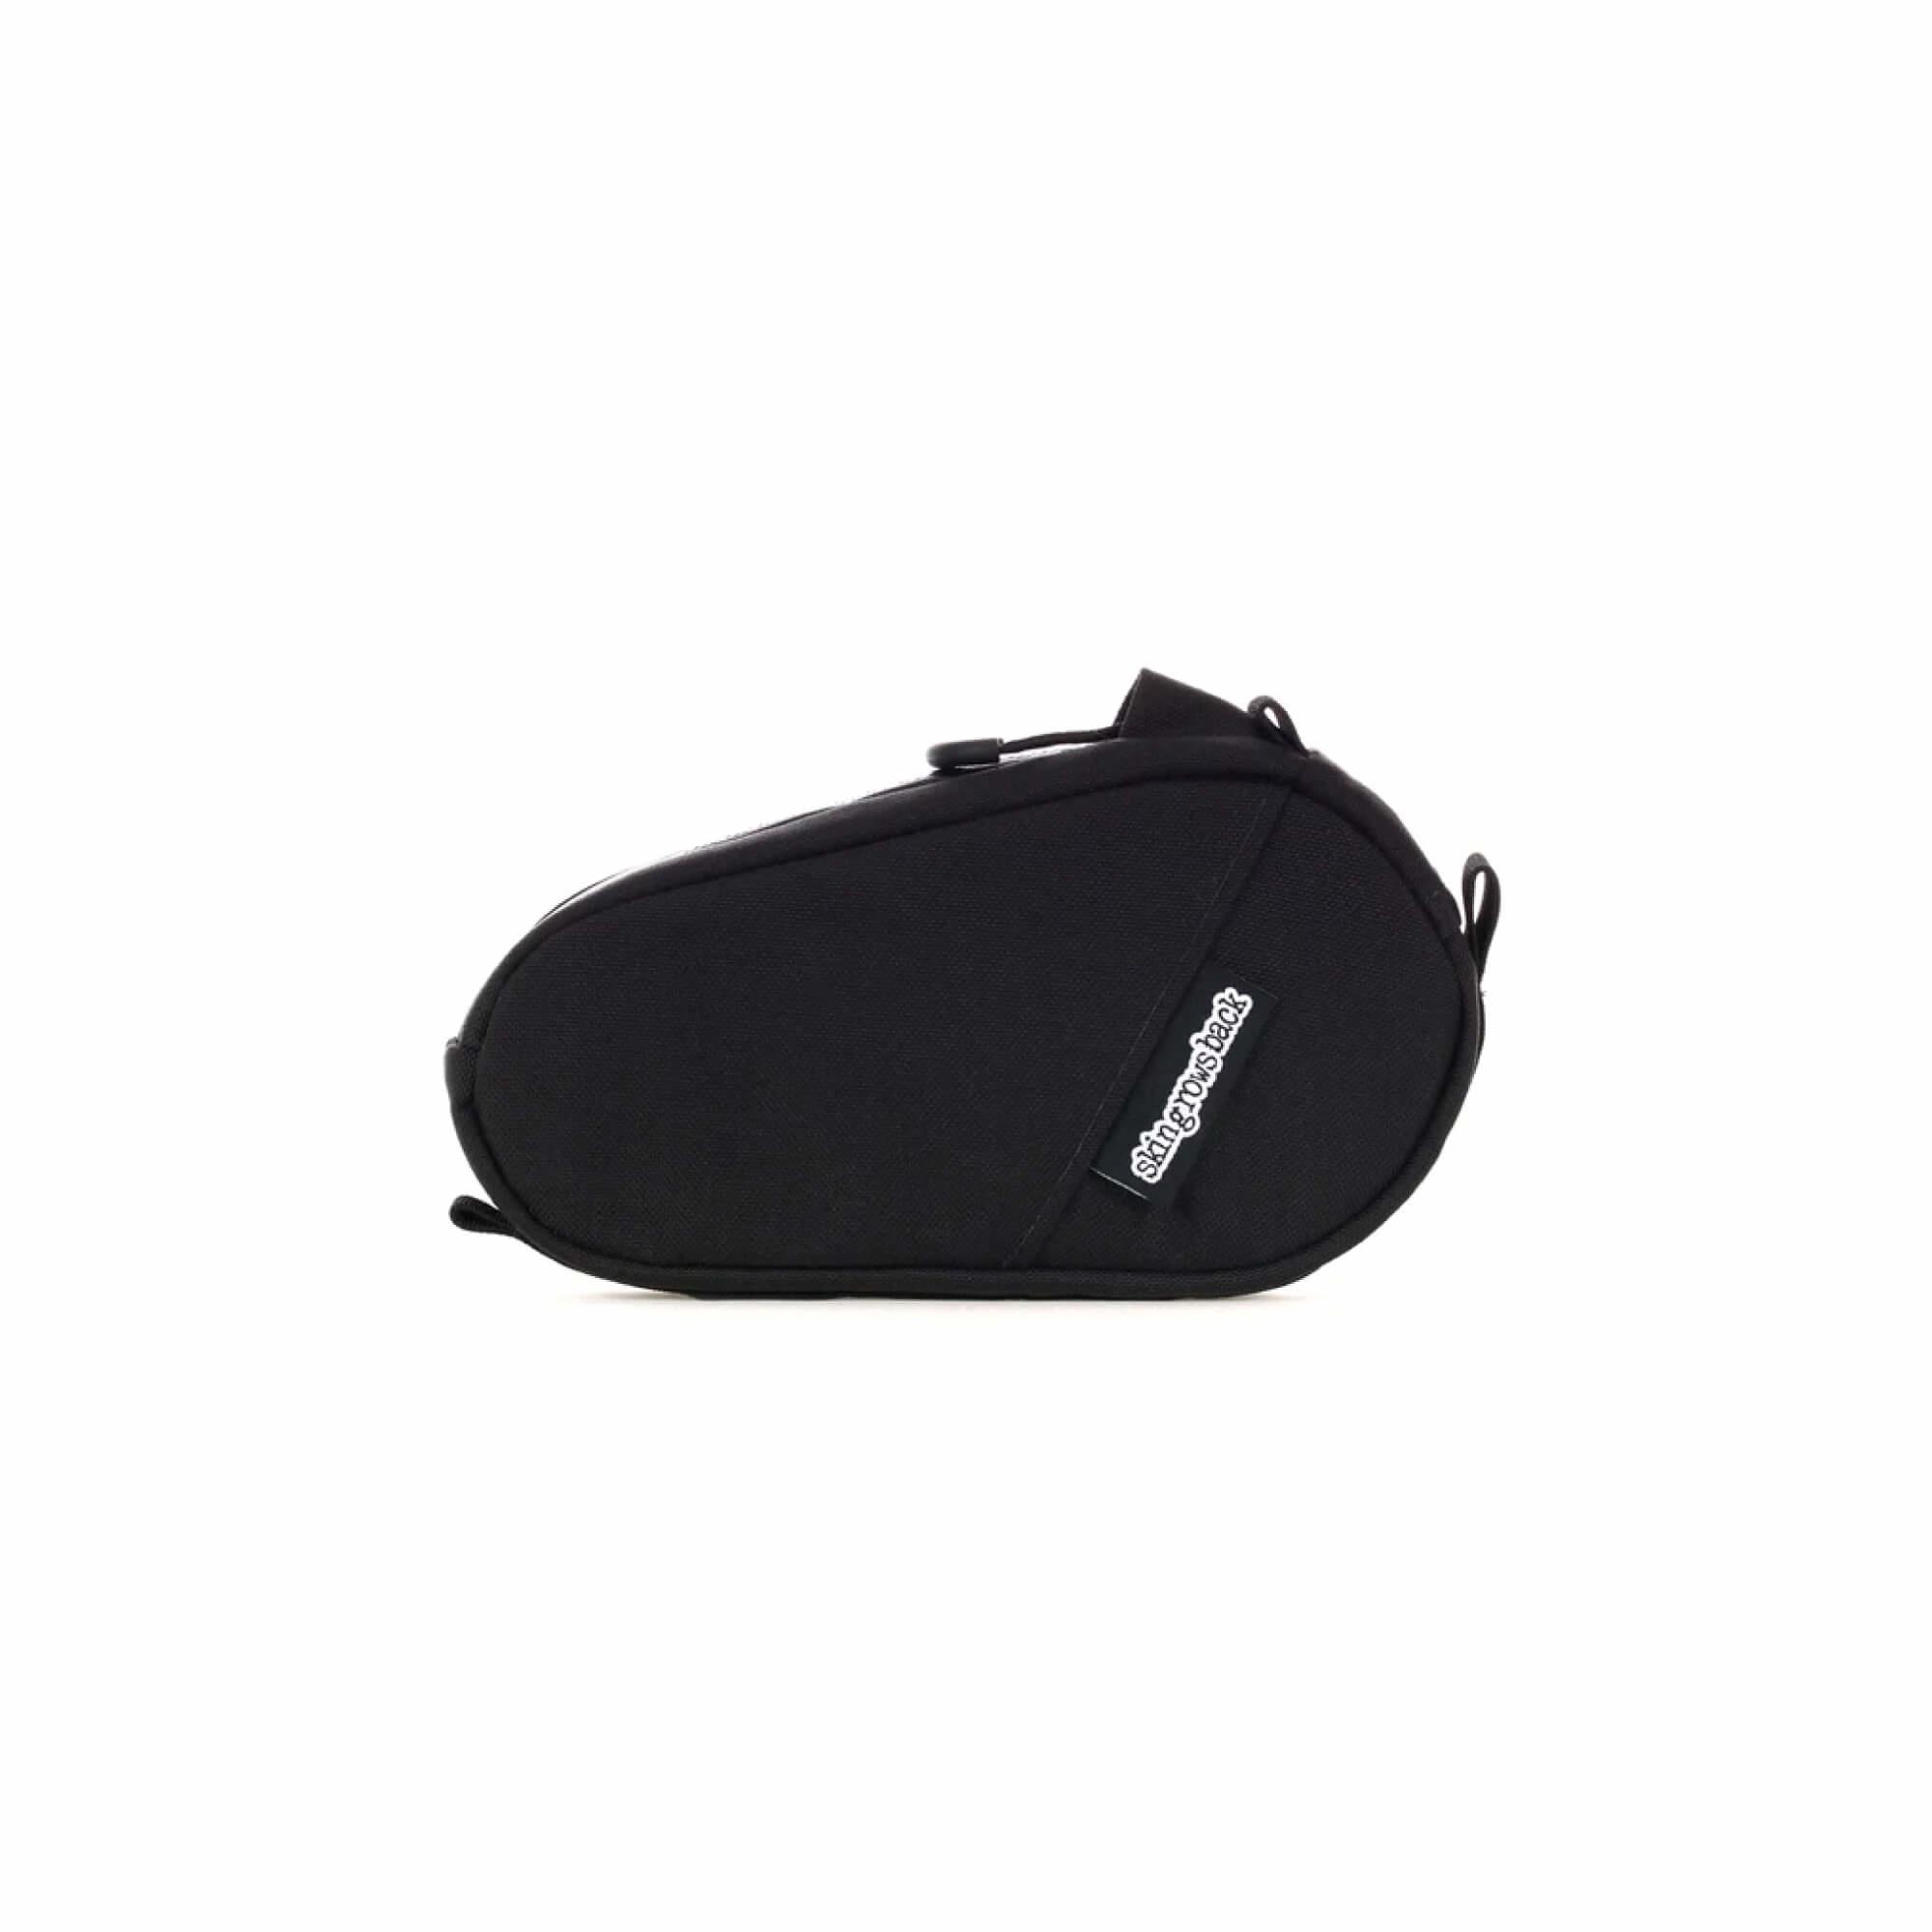 Amigo Top Tube Bag Black-1